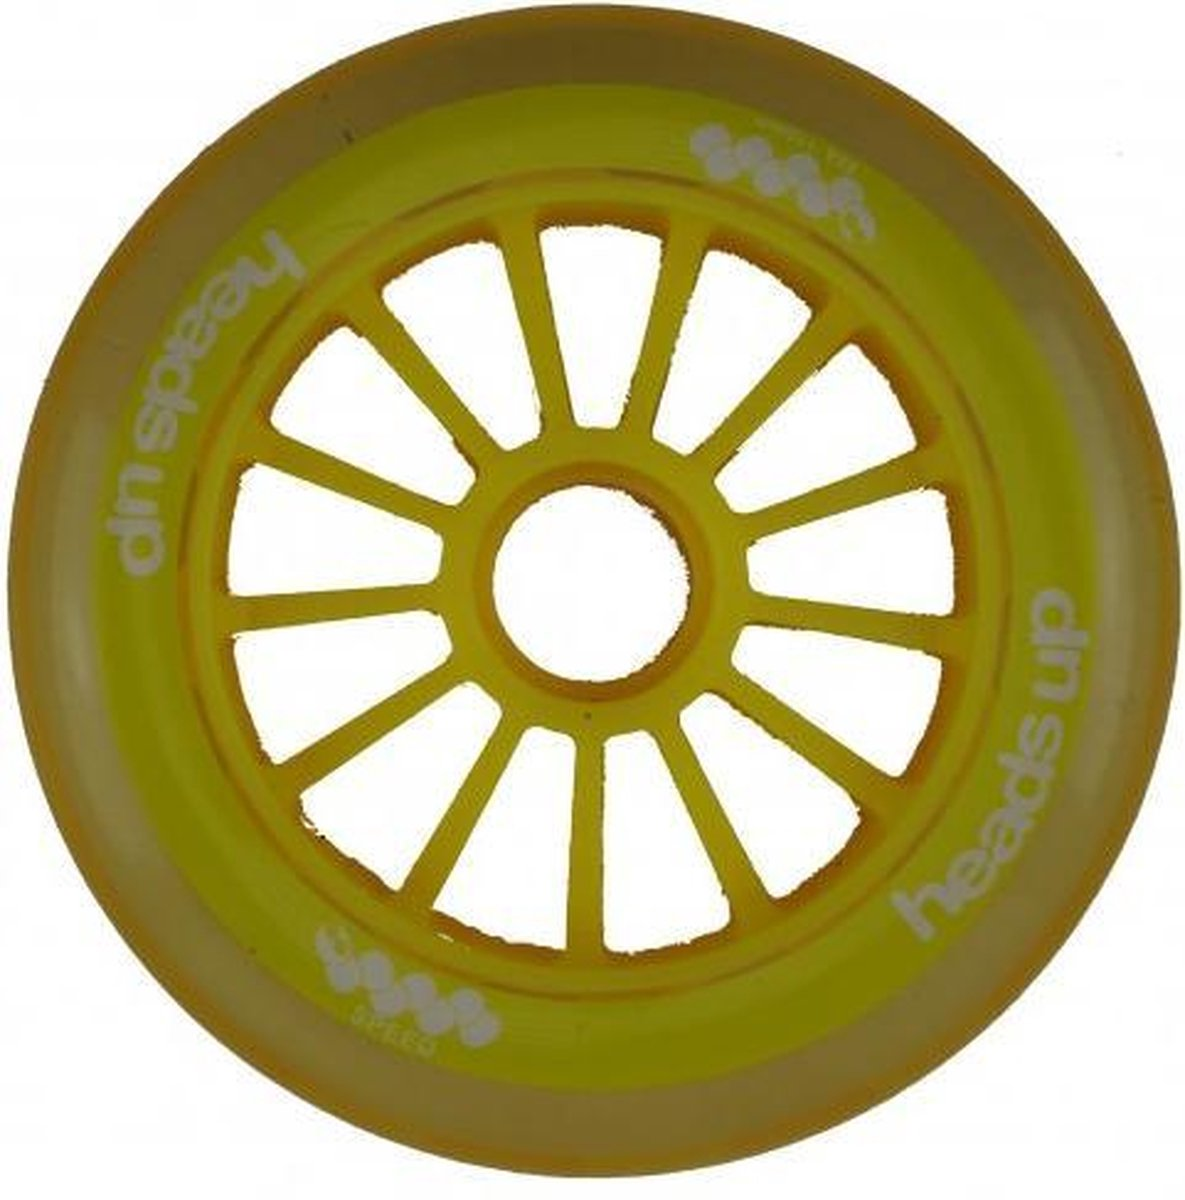 Headsup 110 MM 88A inline skate of step wielen geel 4-pack